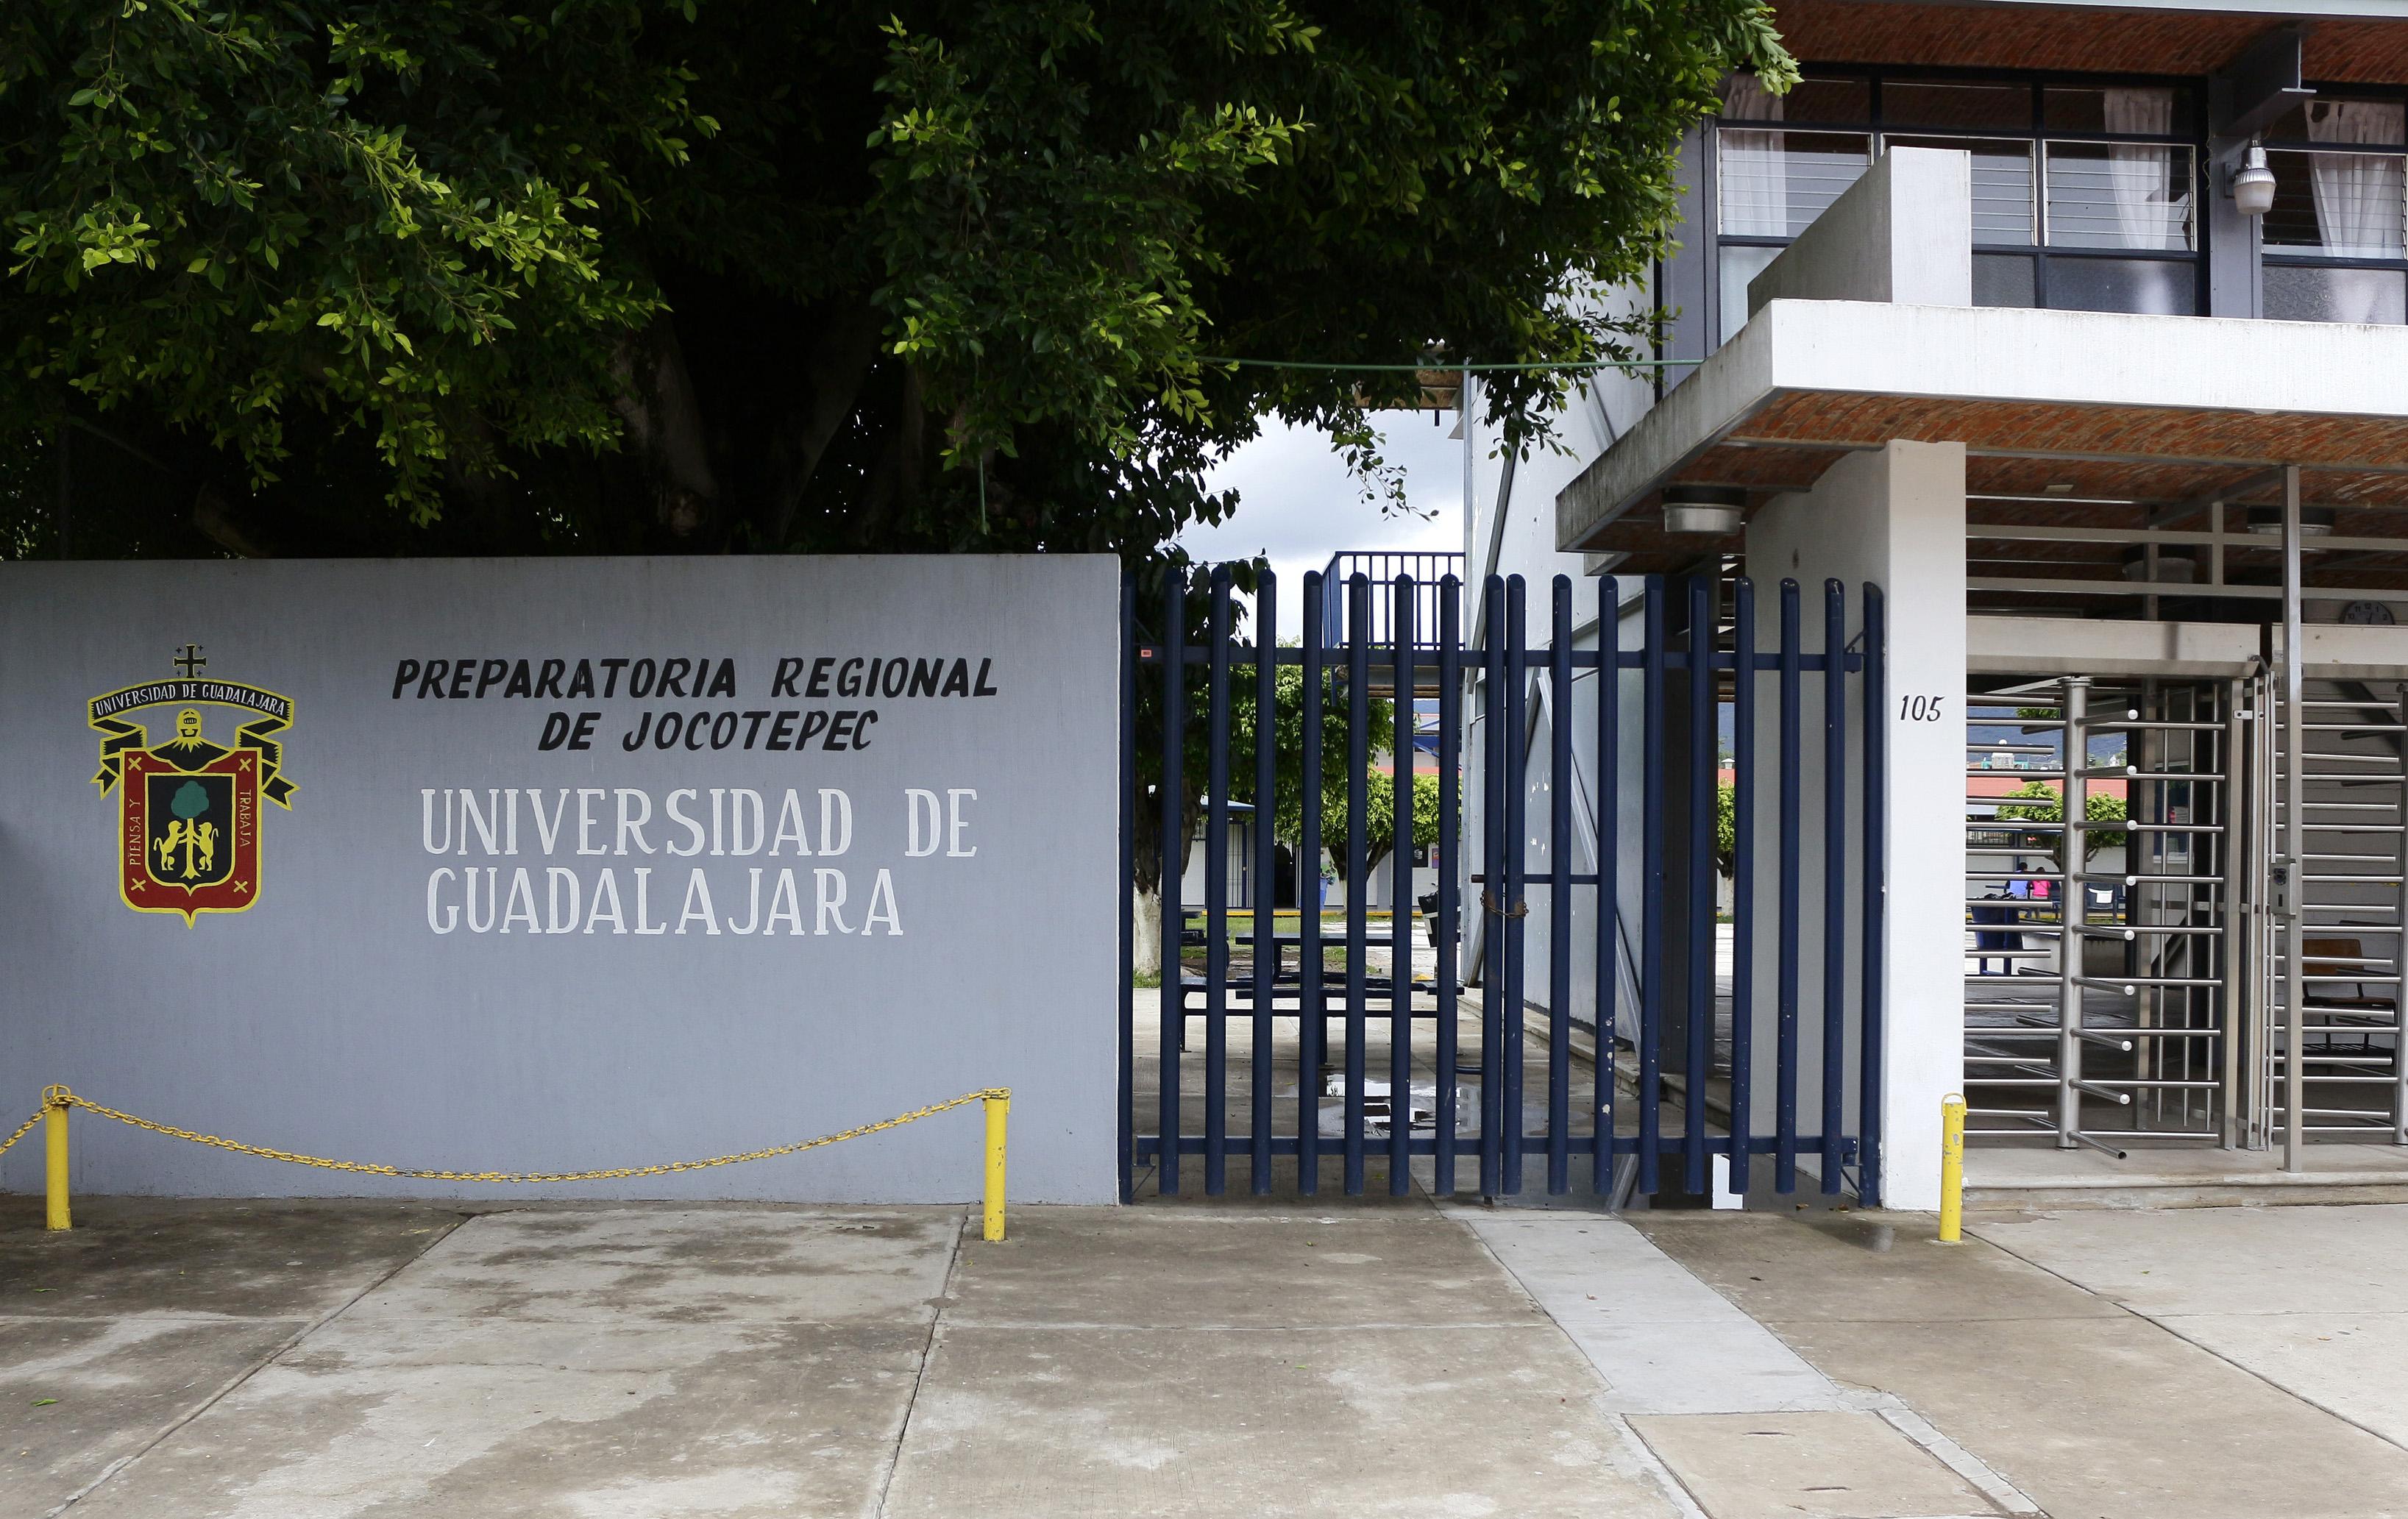 Foto de la entrada principal de la preparatoria regional de Jocotepec de la Universidad de Guadalajara.